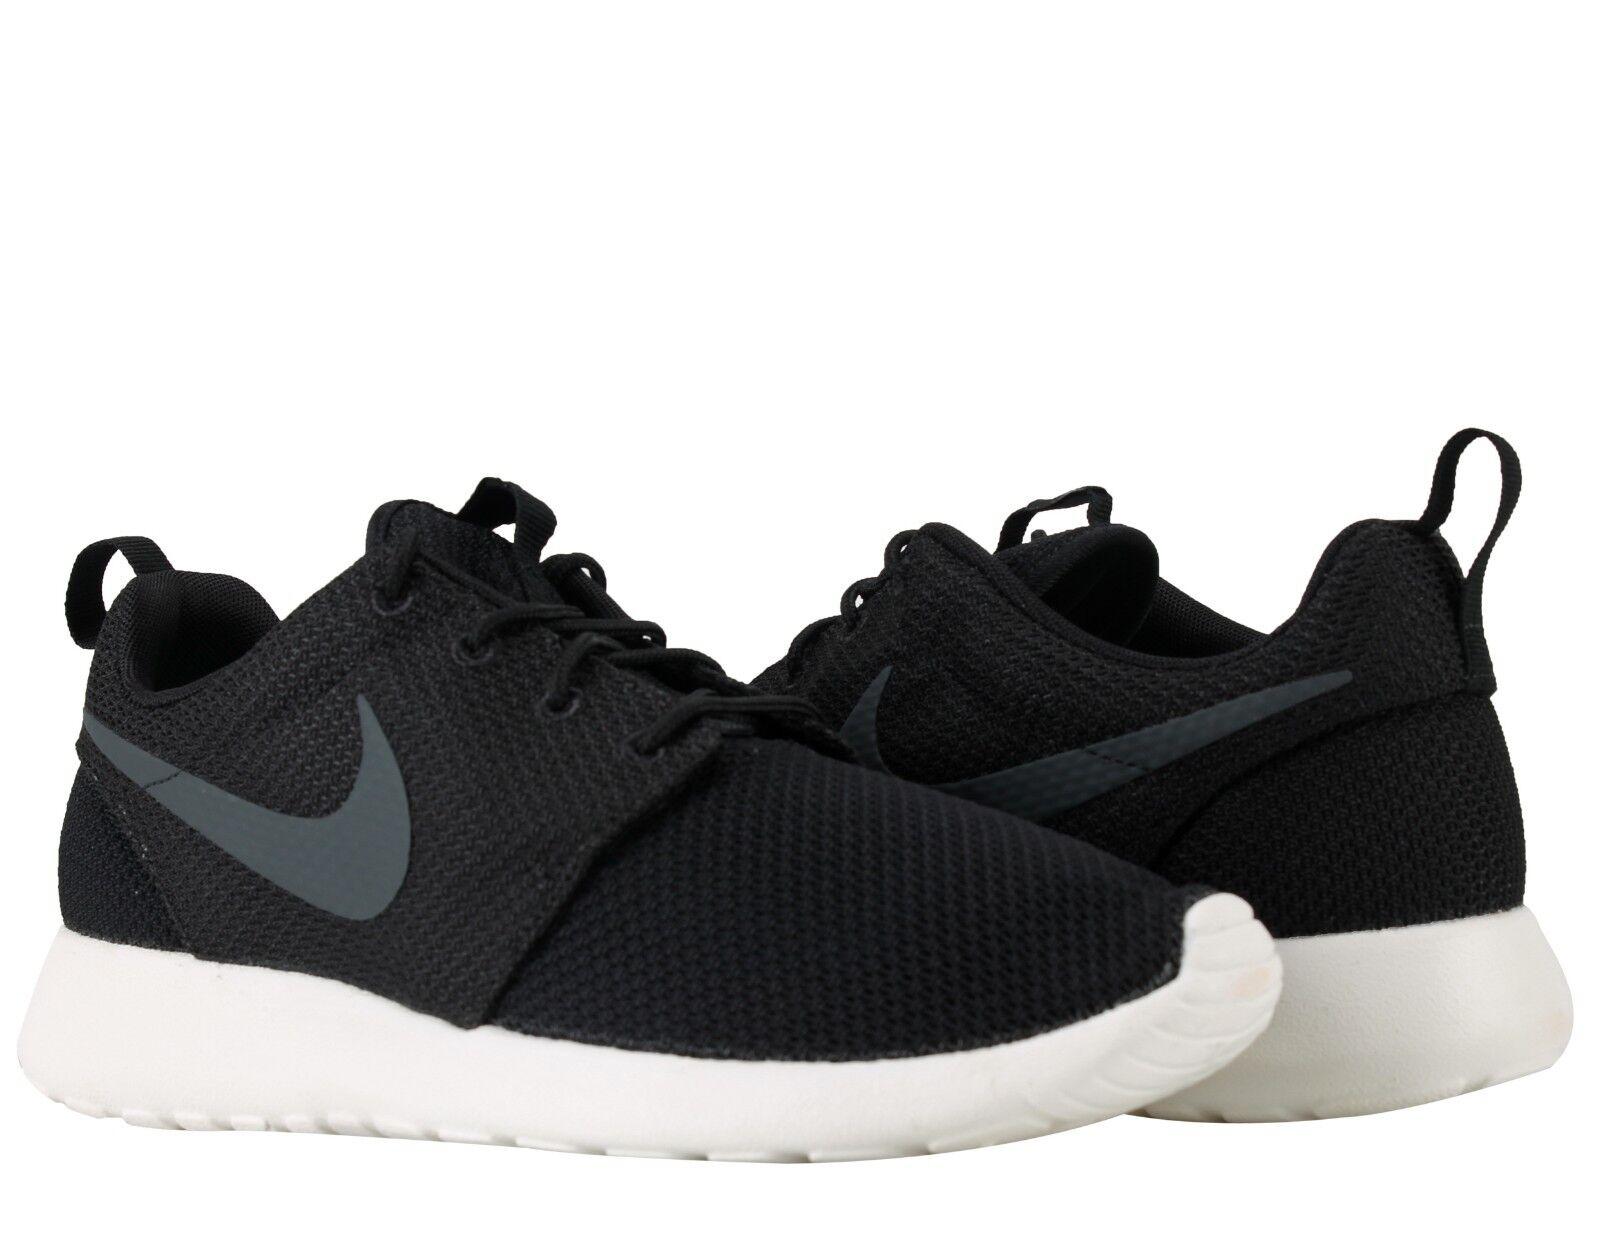 Nike Roshe One Black White Comfortable shoes For Men's New In Box 511881 010